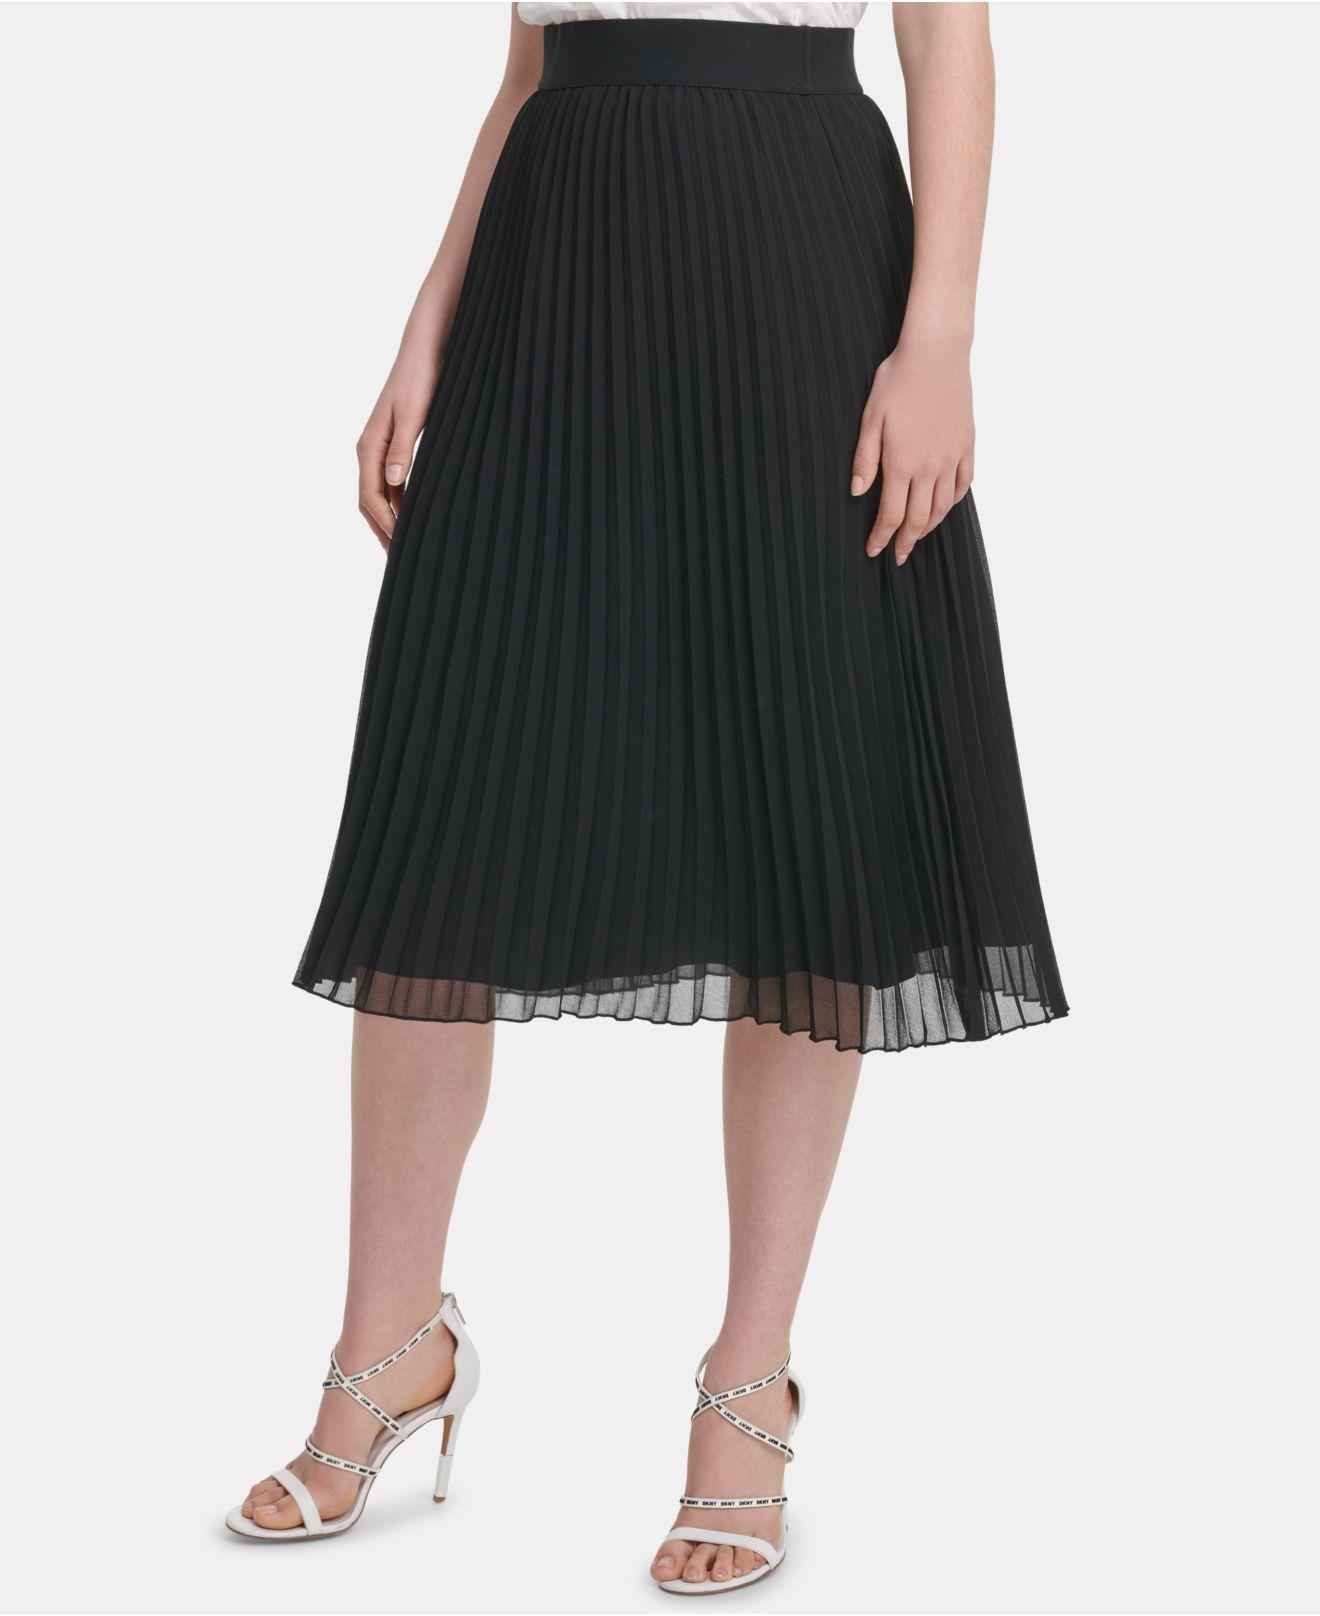 88e76d5fe DKNY Pull-on Pleated Skirt in Black - Lyst